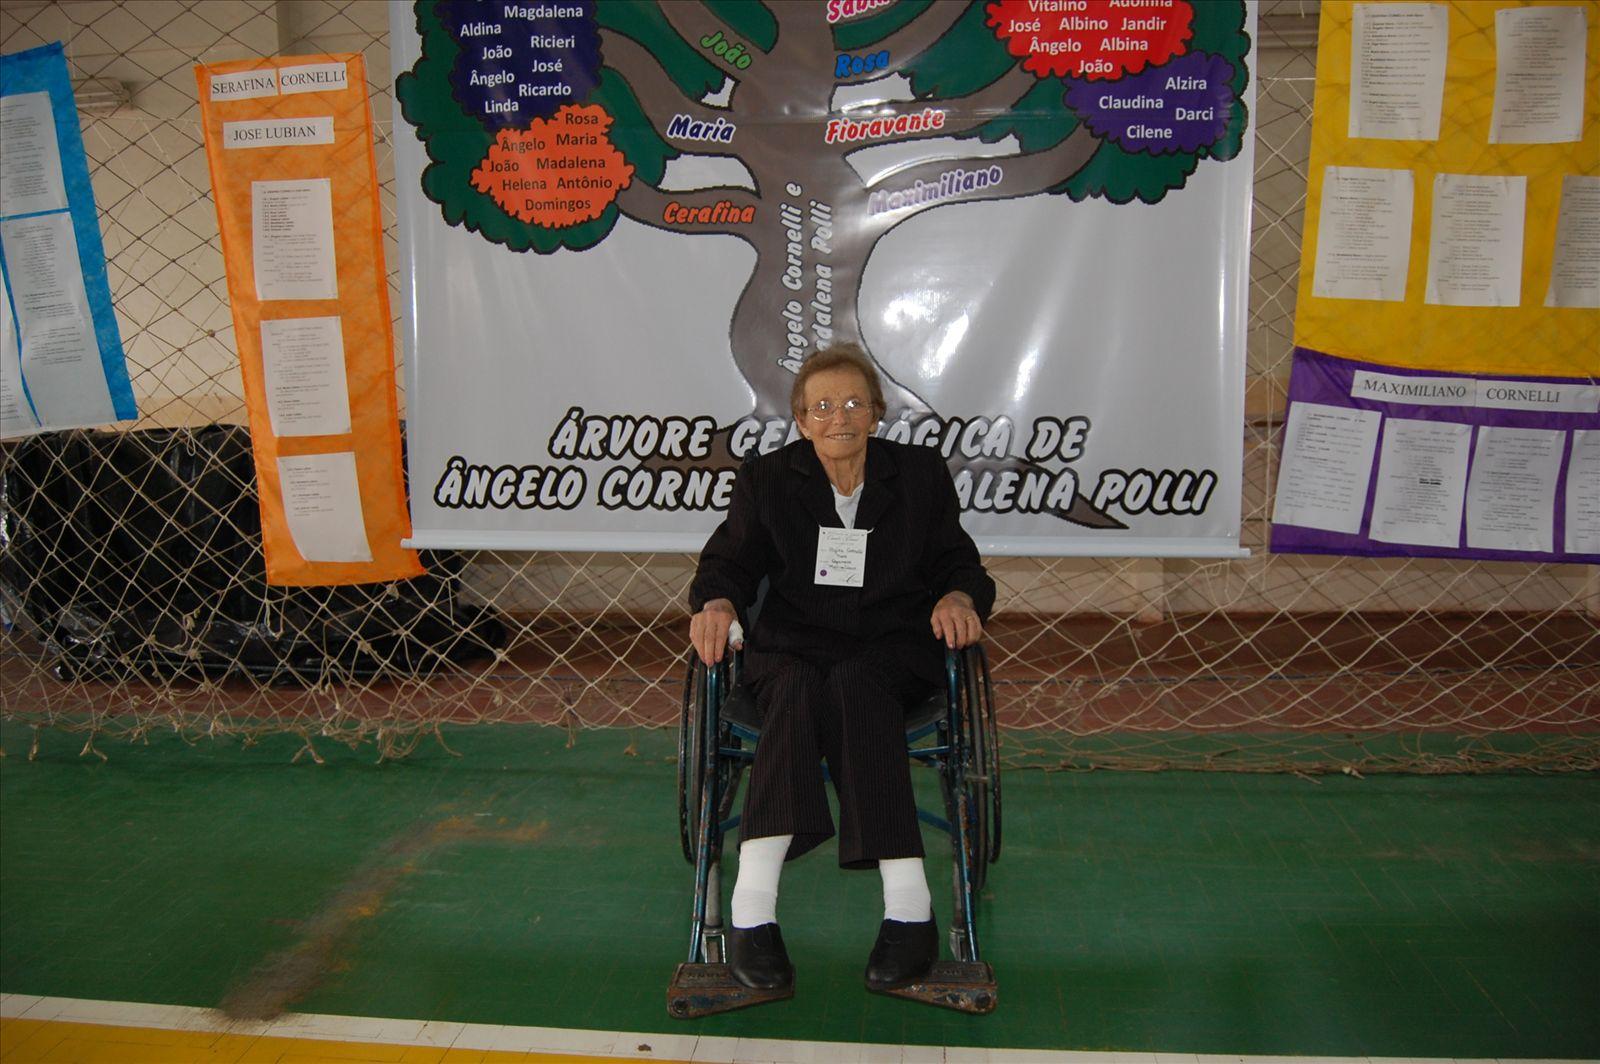 2º Encontro Família Cornelli - 11.10.2009 (206)_0